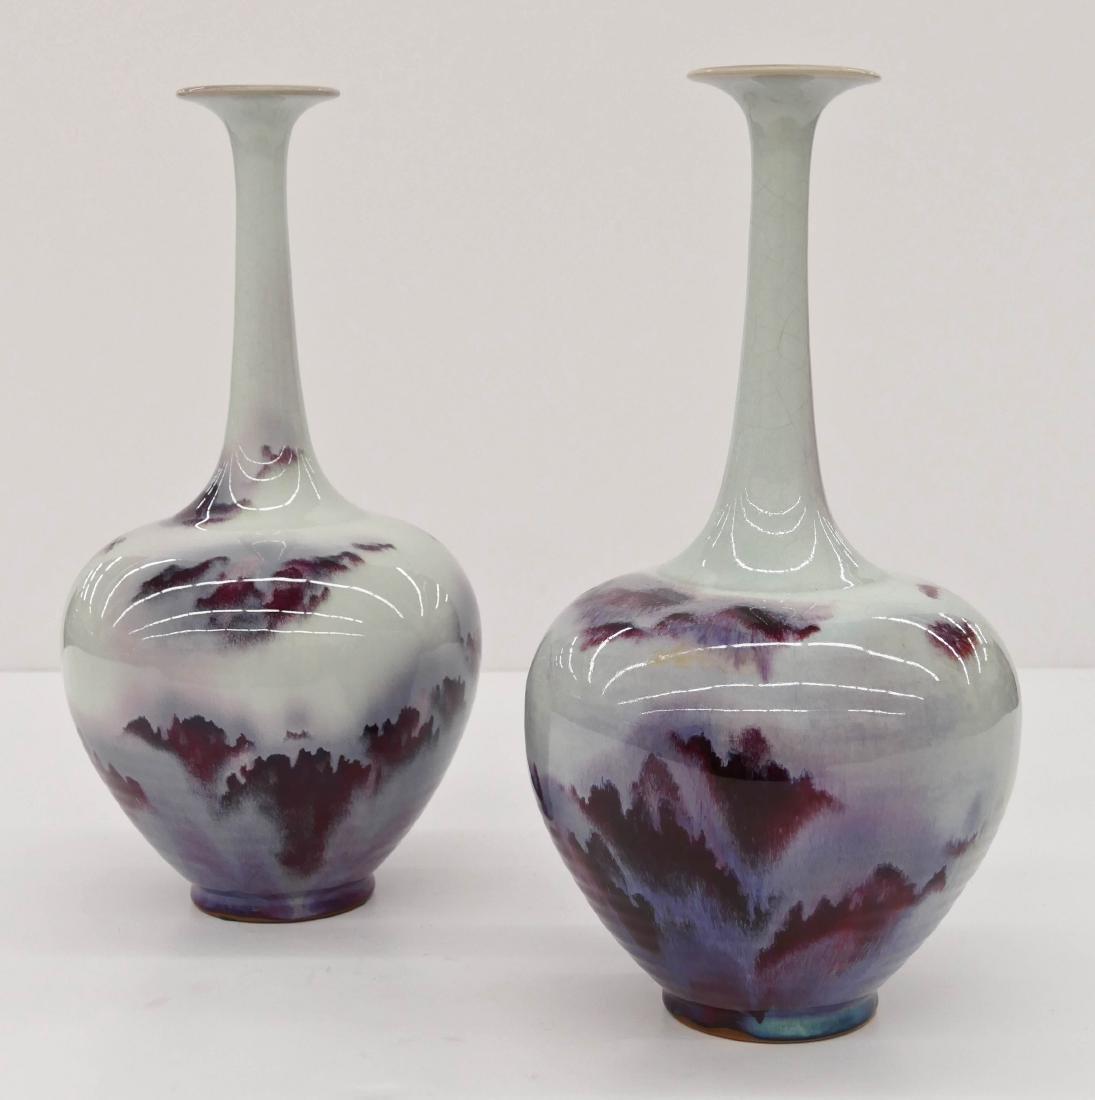 Pair of Chinese Flambe Glazed Bottle Vases 15''x8''